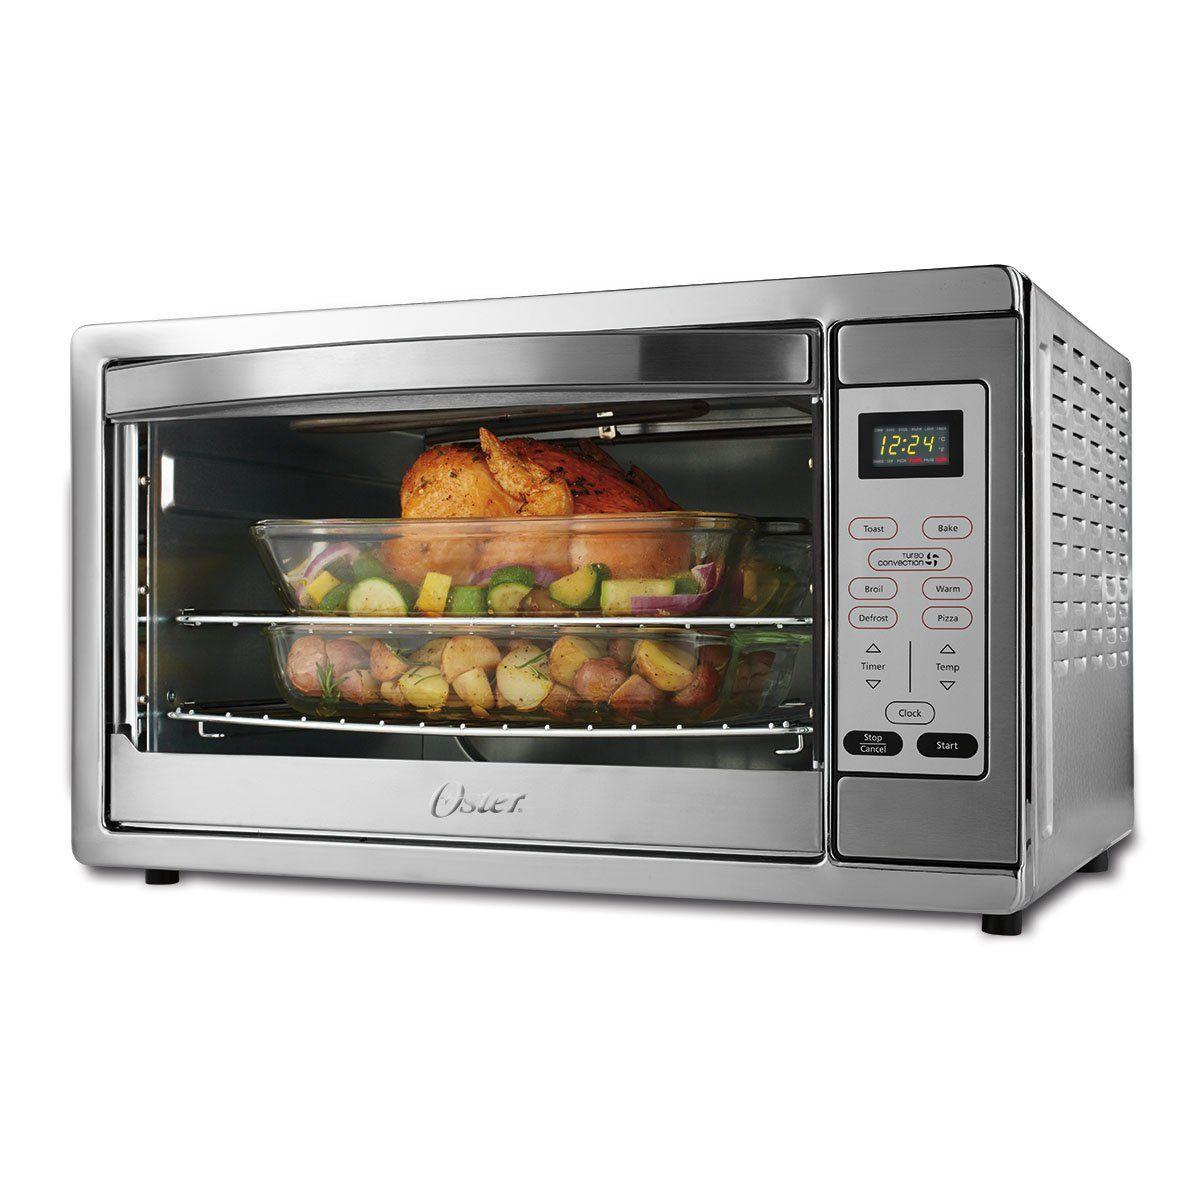 Extra Large Digital Countertop Oven Countertop Oven Countertop